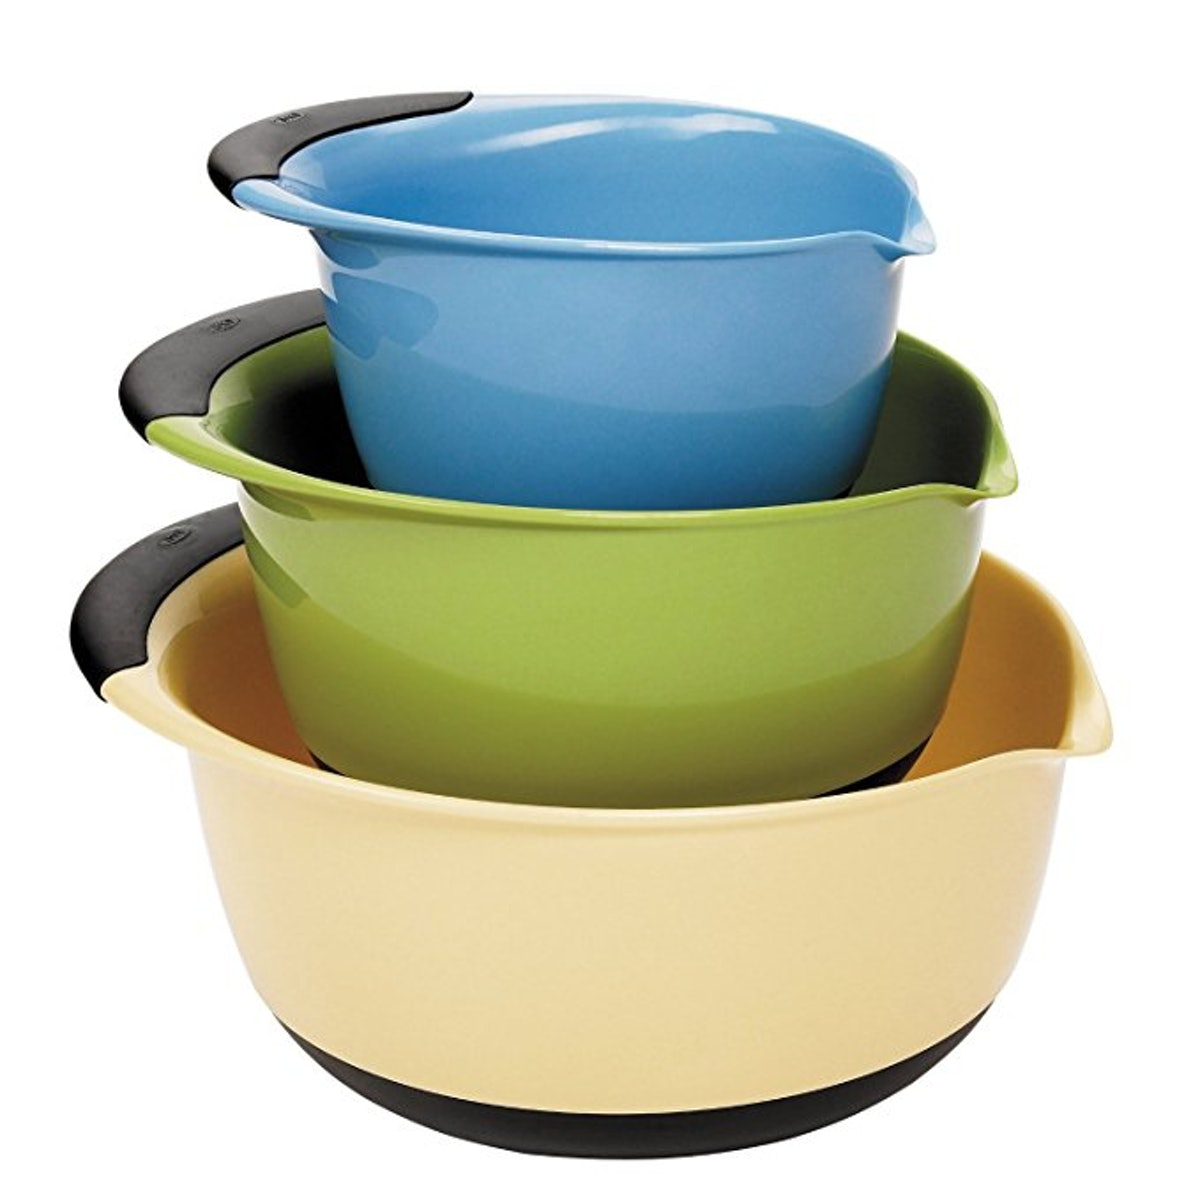 OXO Good Grips Nesting Bowls